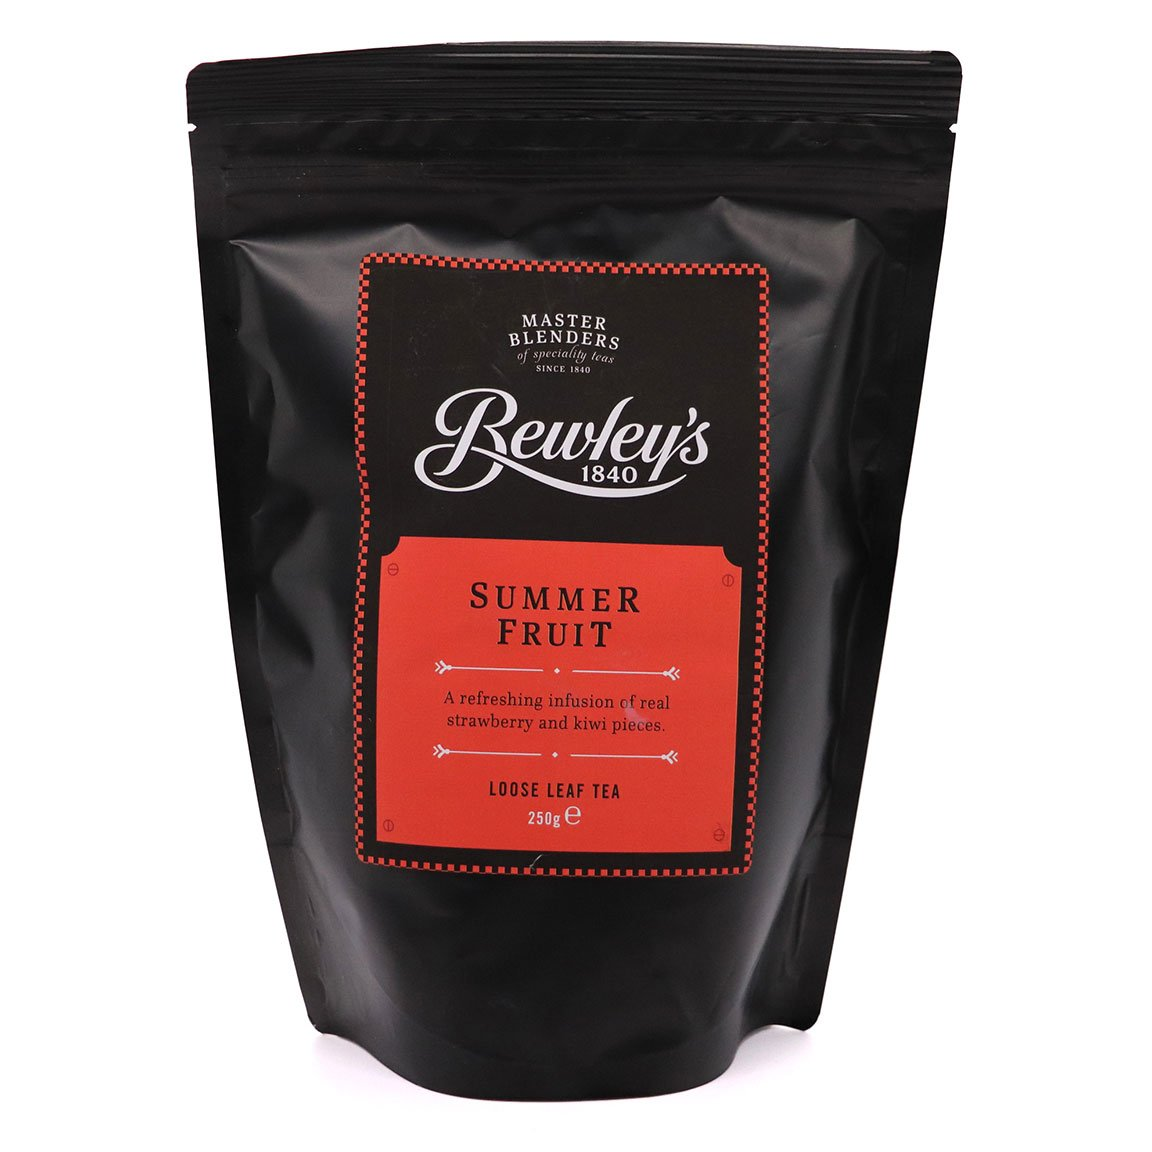 Bewley's Summer Fruit Loose Leaf Tea